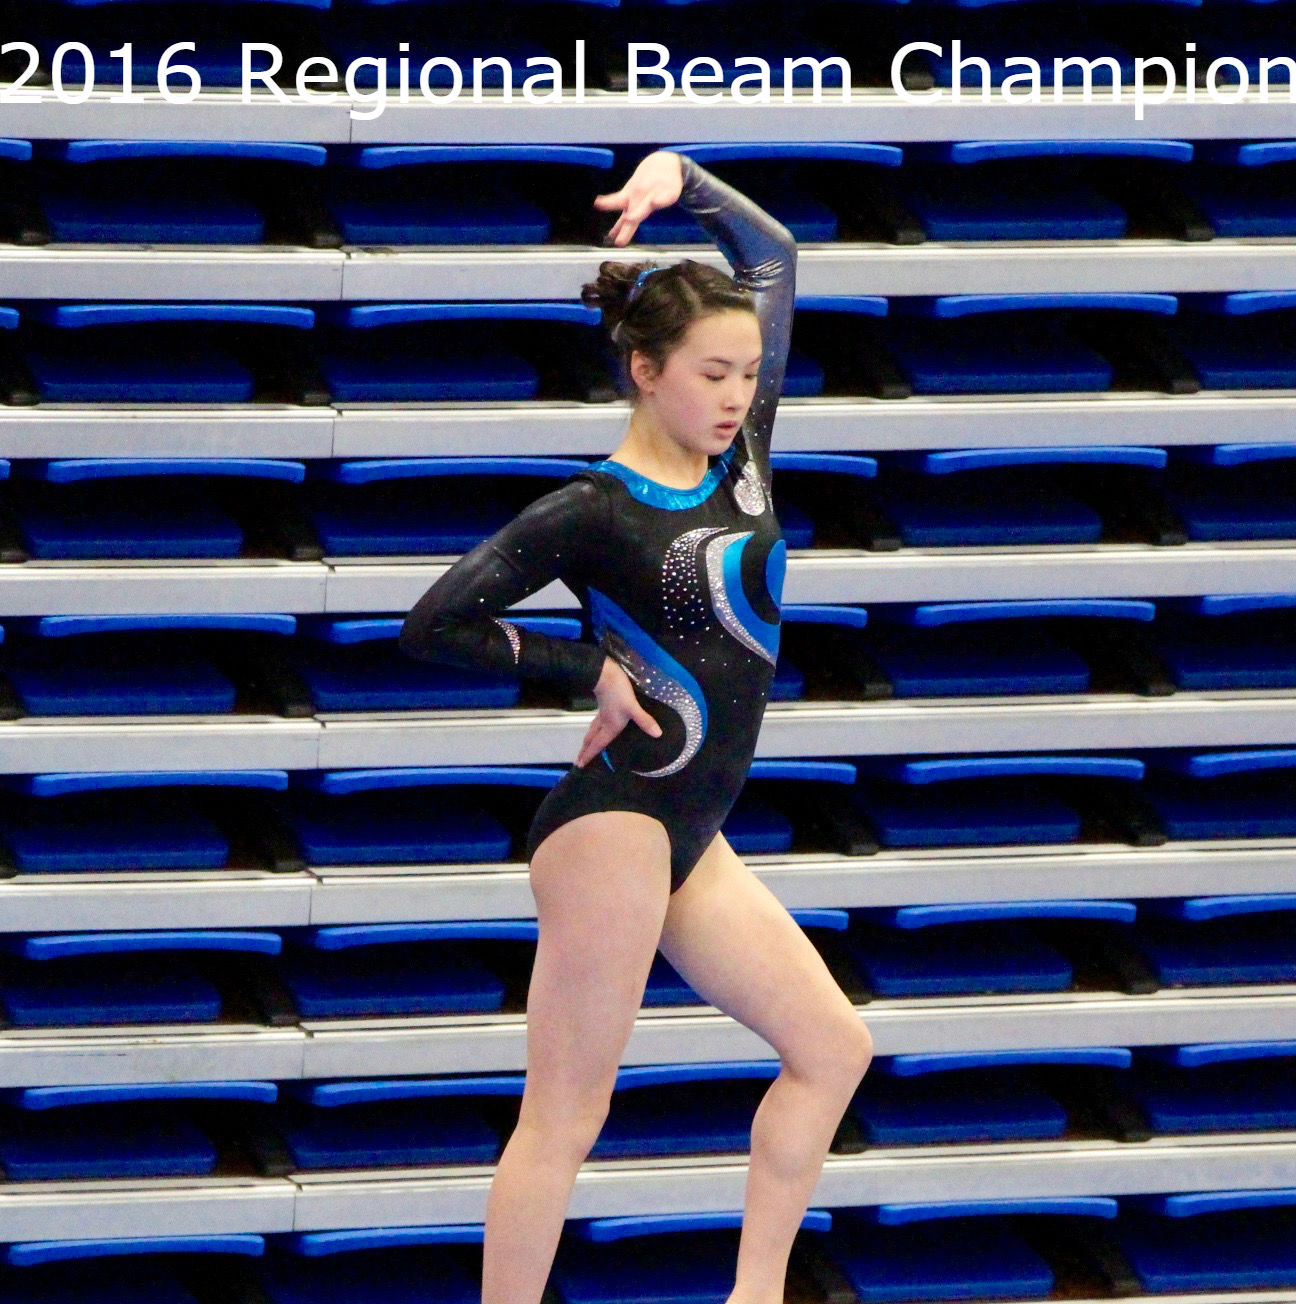 Liv Markey 2016 Regional Beam Champ (2).jpg